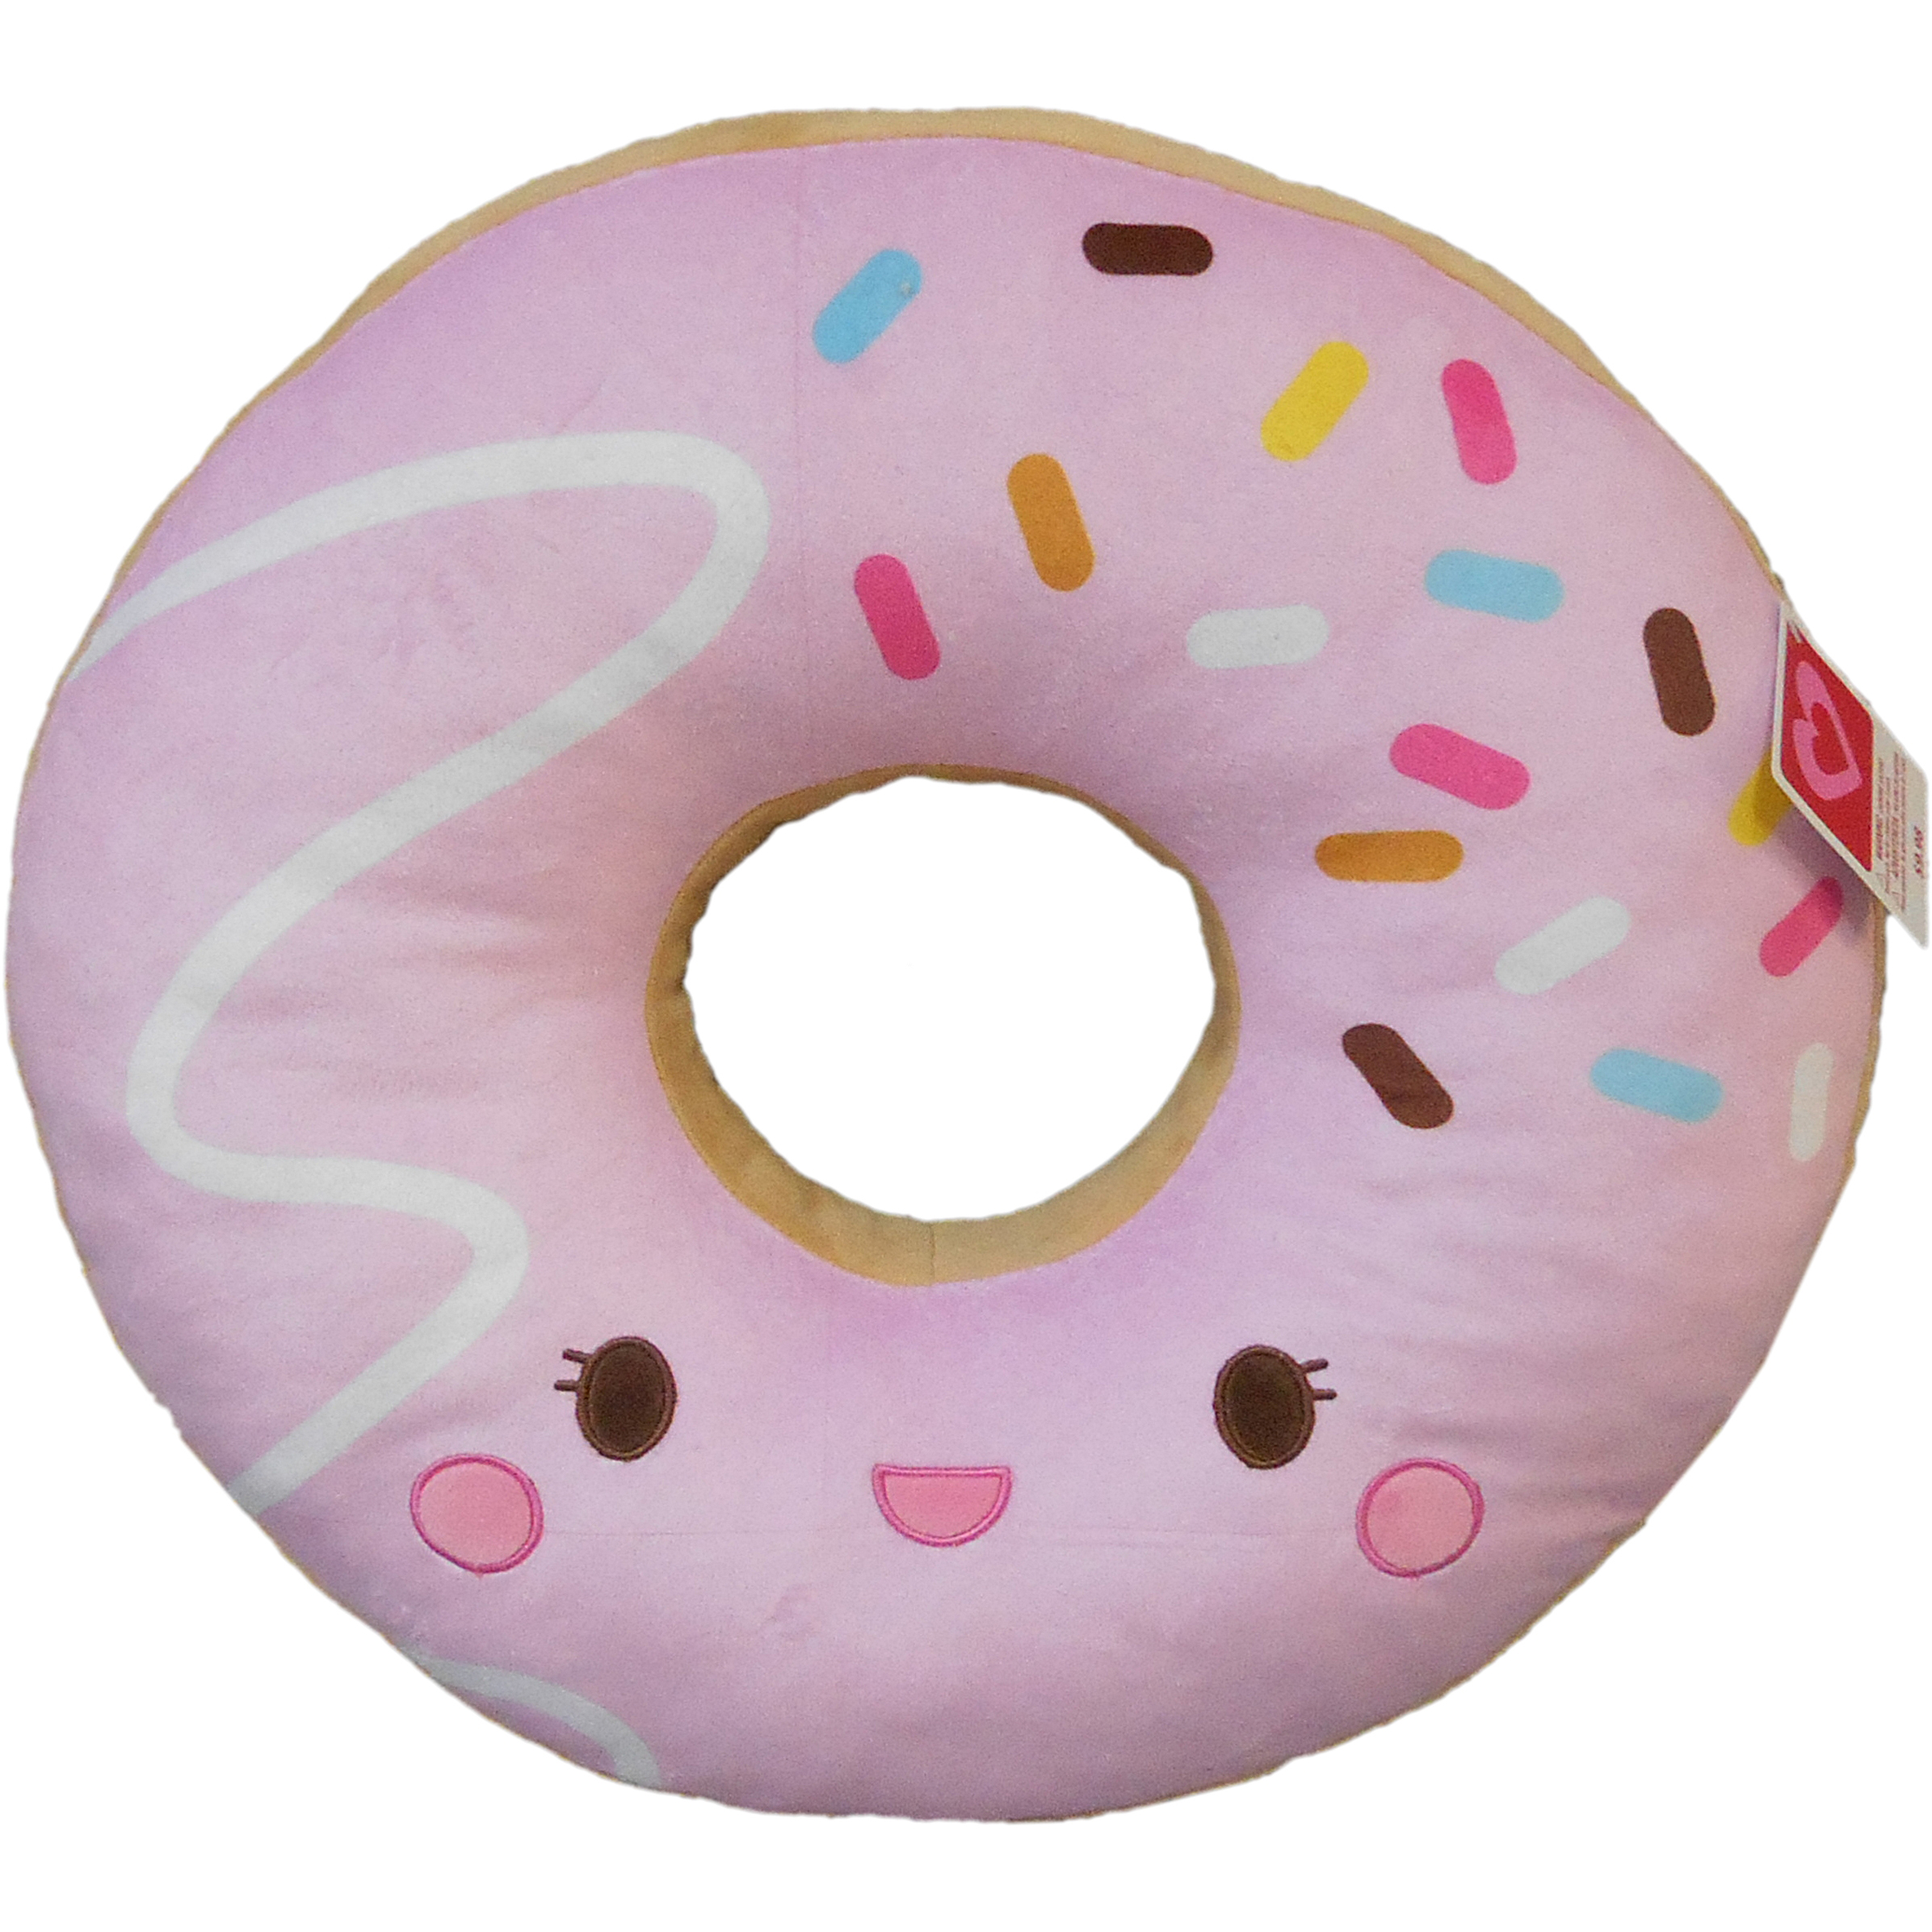 valentine s day 18 donut plush pillow